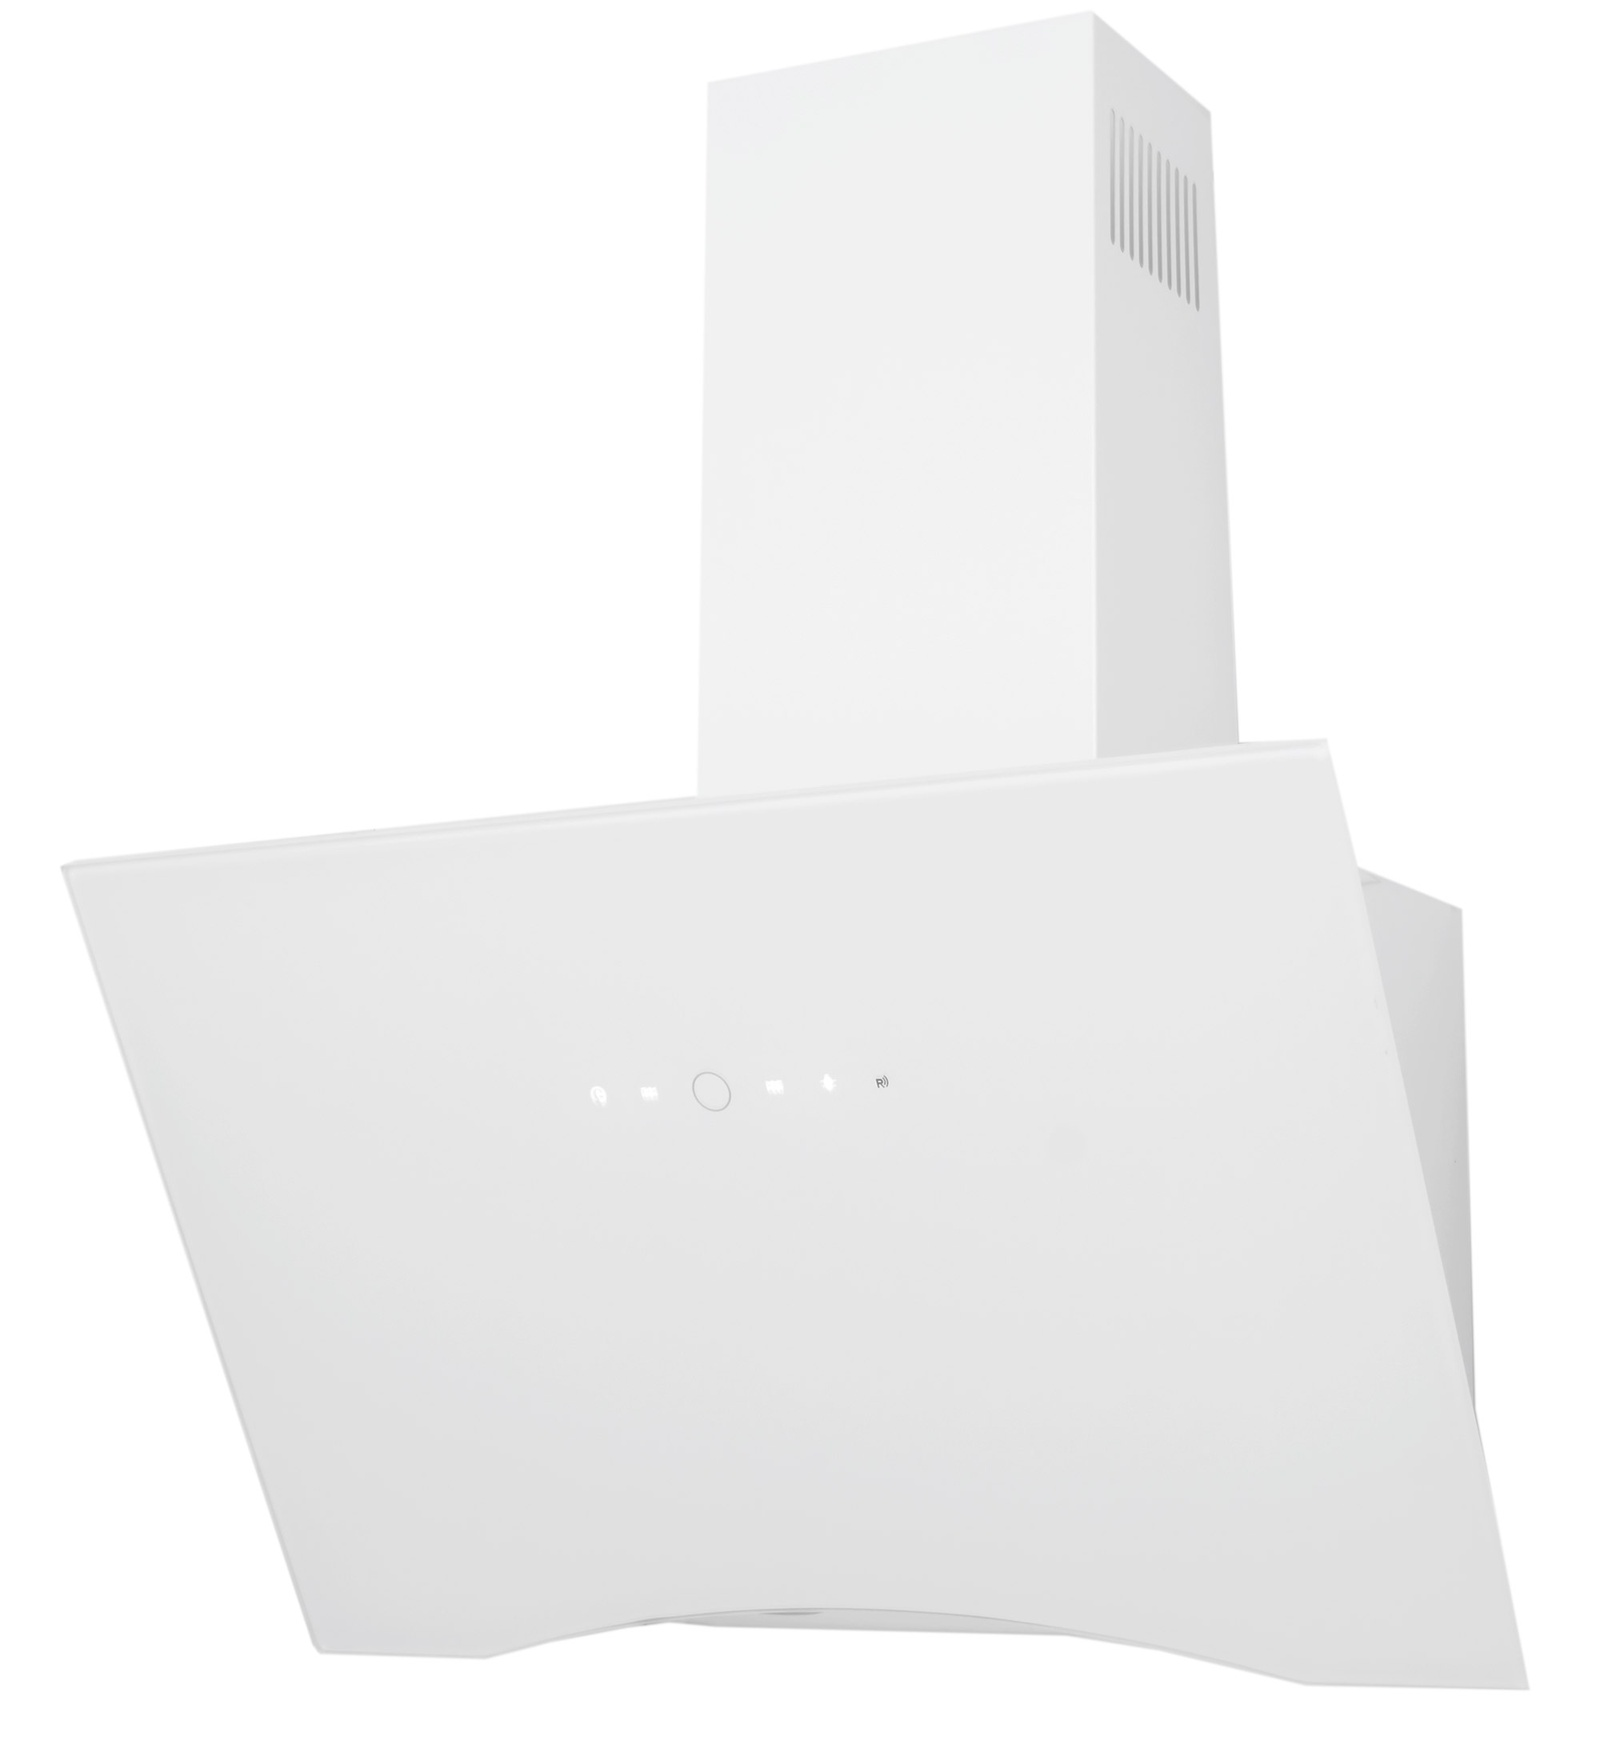 Вытяжка Exiteq EX-1116 white, 30220, белый